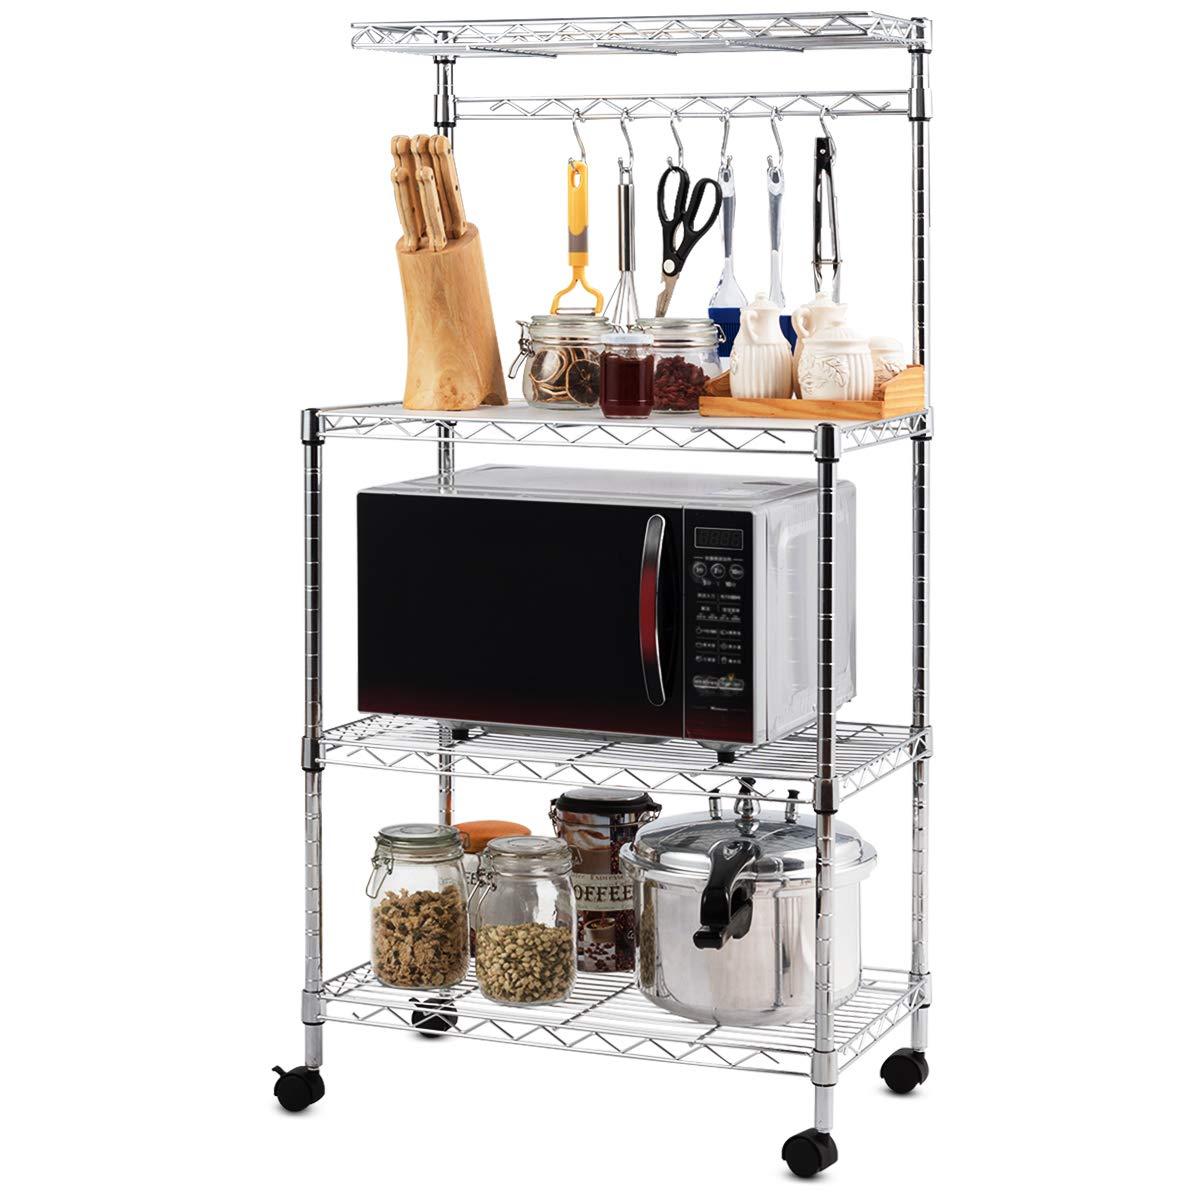 Giantex 4-Tier Baker's Rack Microwave Rack Free Standing Storage Shelf Microwave Oven Stand Kitchen Cart Storage Organizer Shelf Workstation w/Adjustable Shelf and 6 Hooks by Giantex